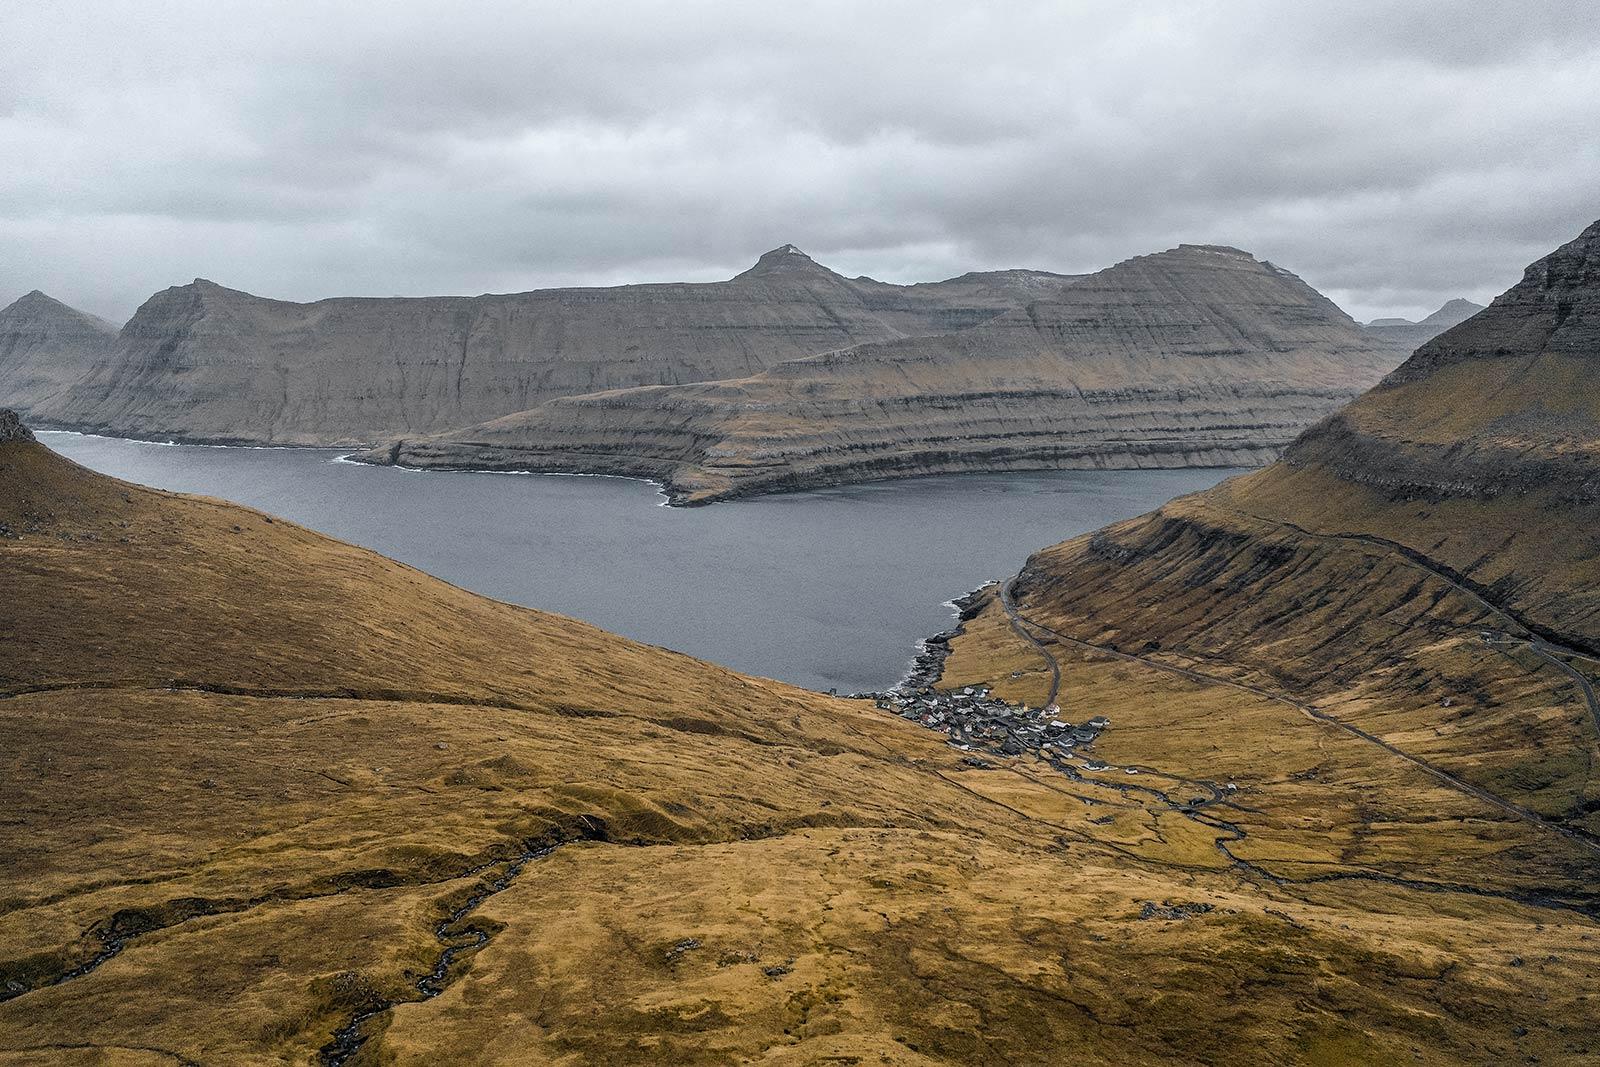 Villingdalsfjall in Faroe Islands. Getting blown off Mt Villingardalsfjall